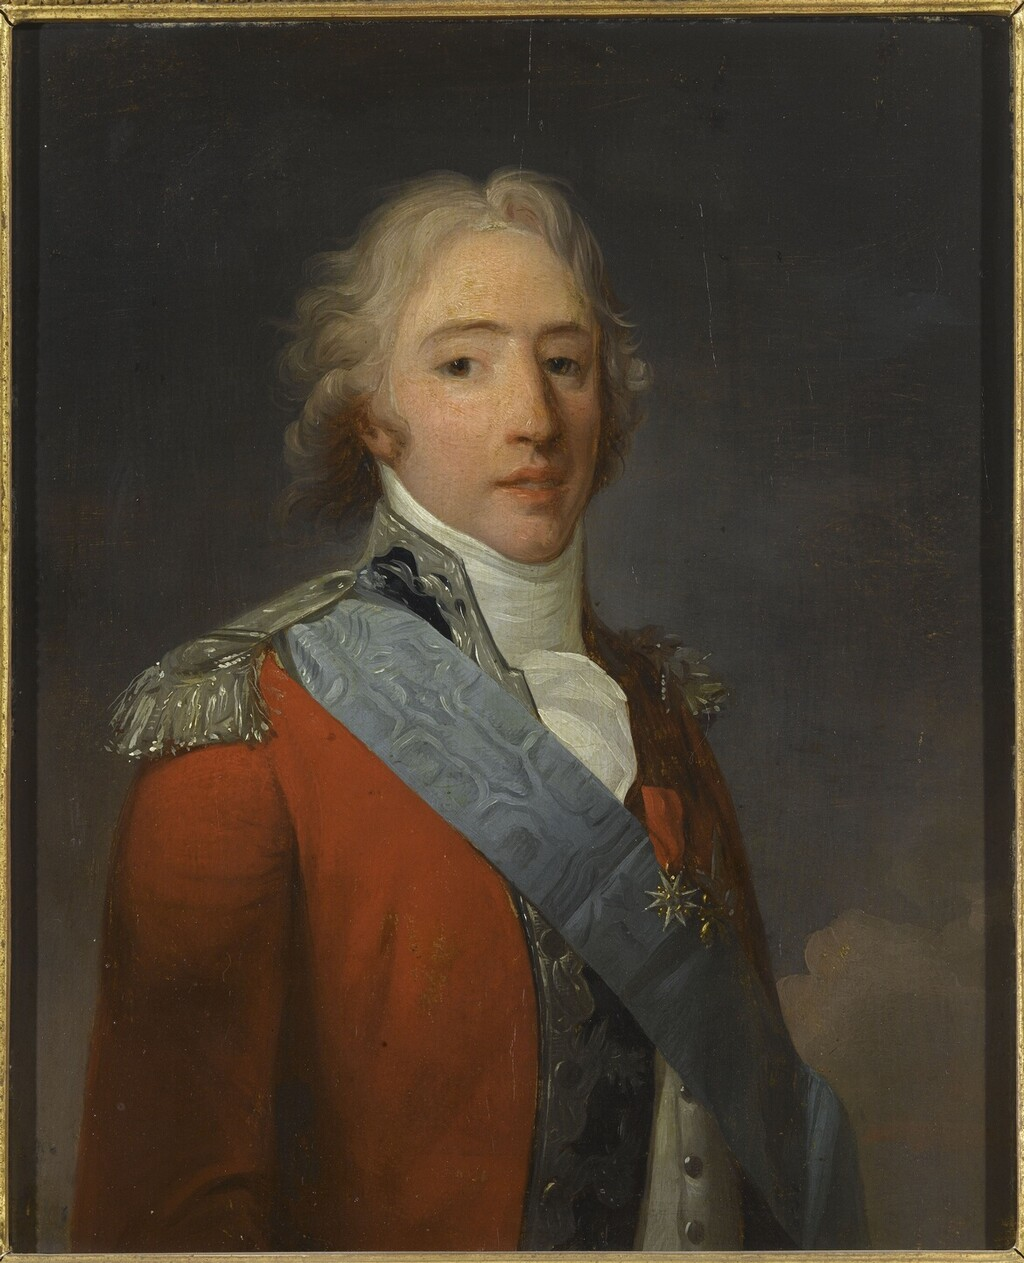 Le comte Charles-Philippe d'Artois, futur Charles X - Page 5 Image348